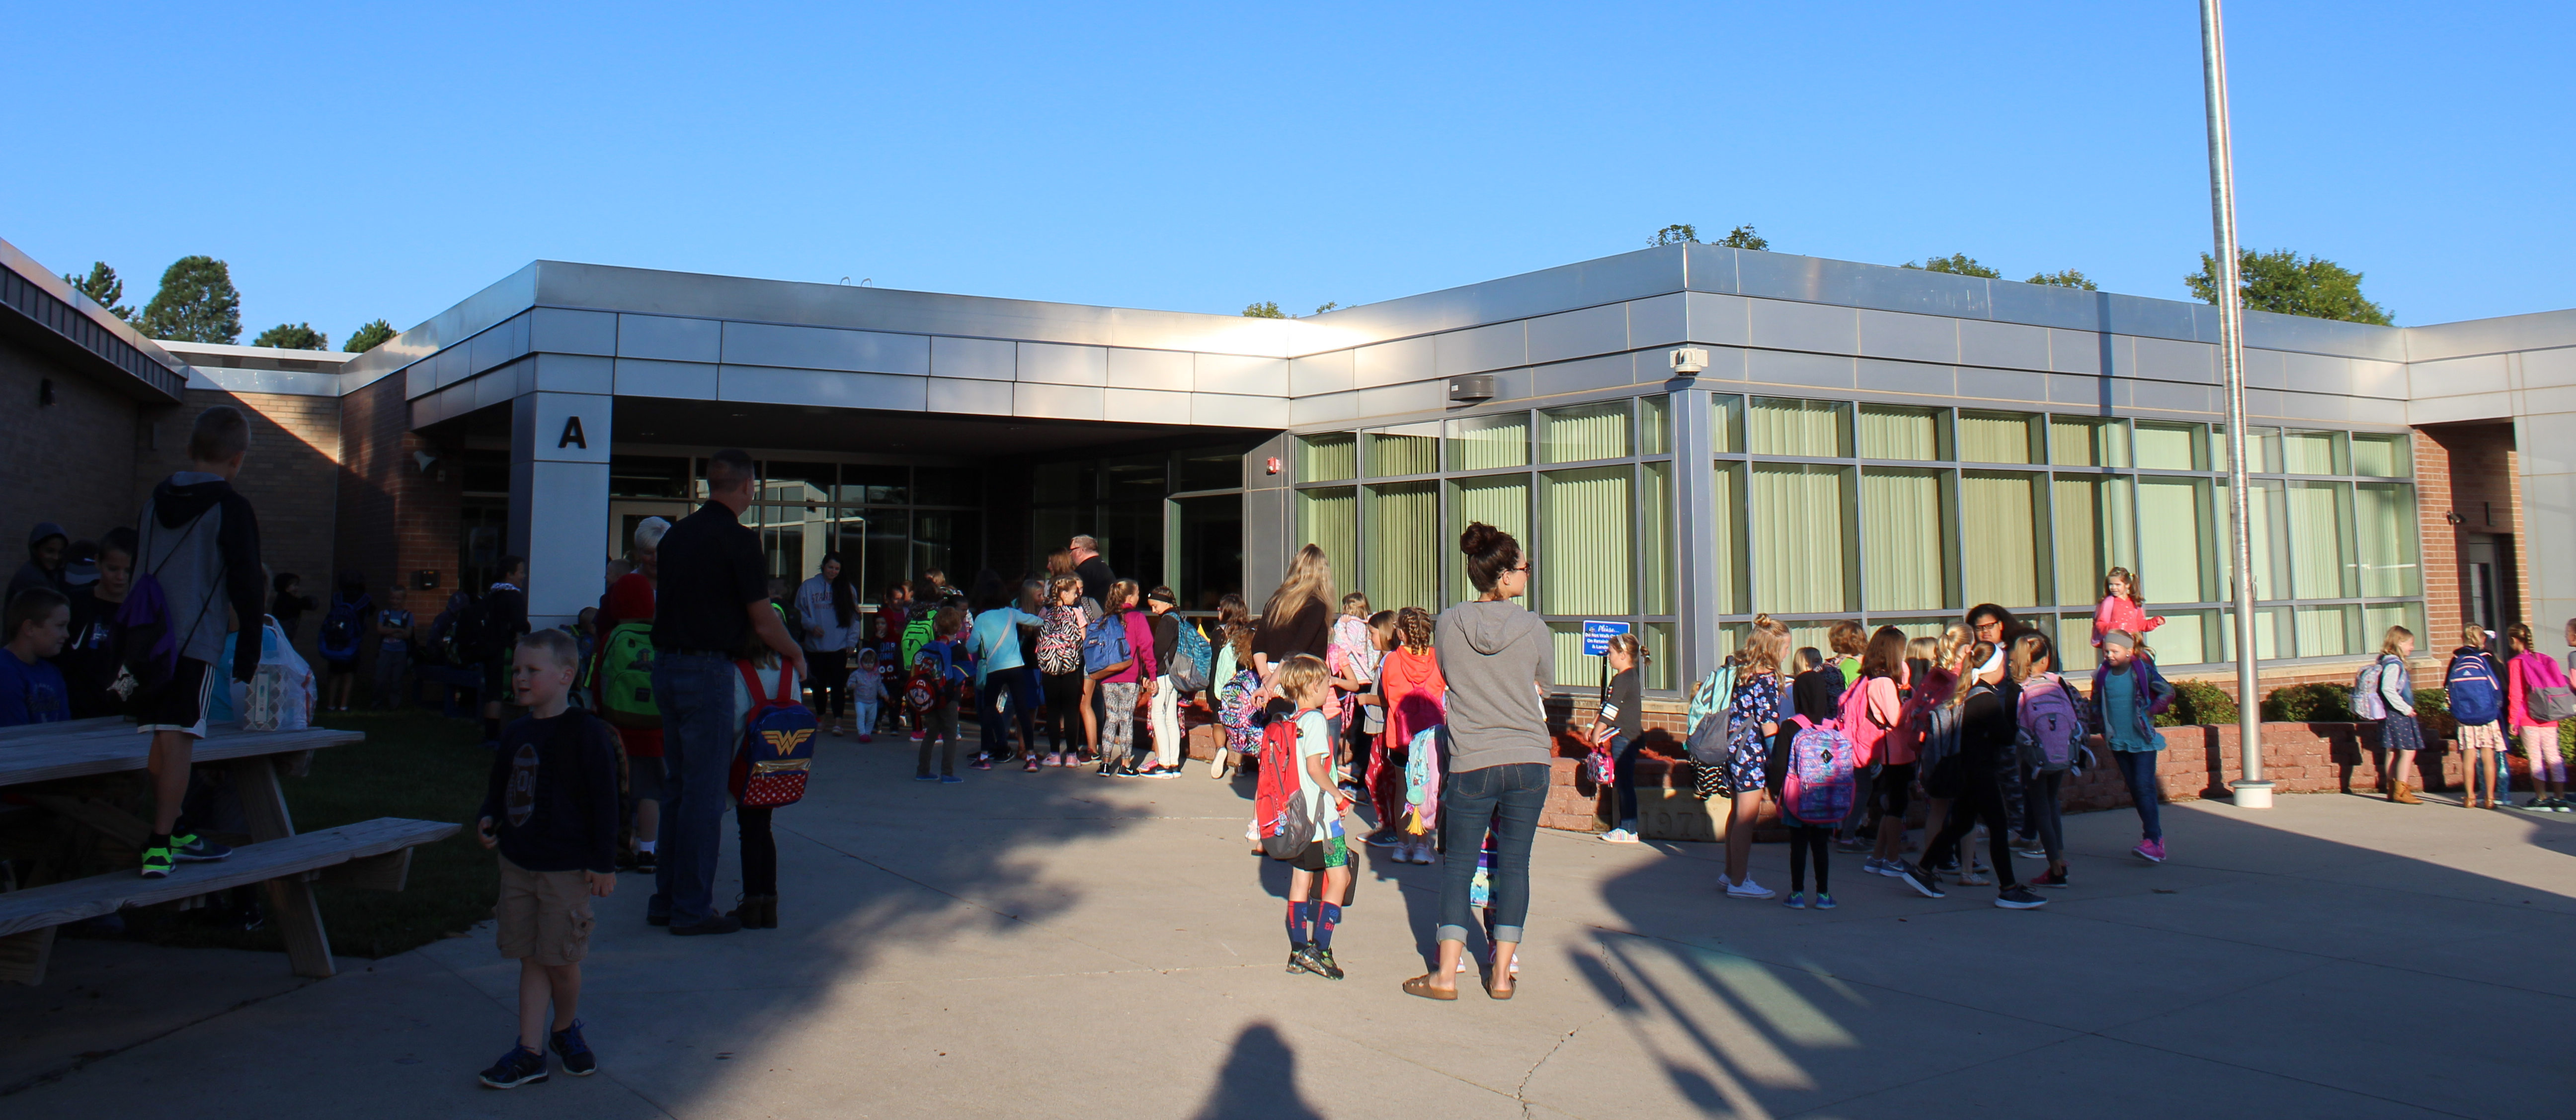 LCWM Elementary